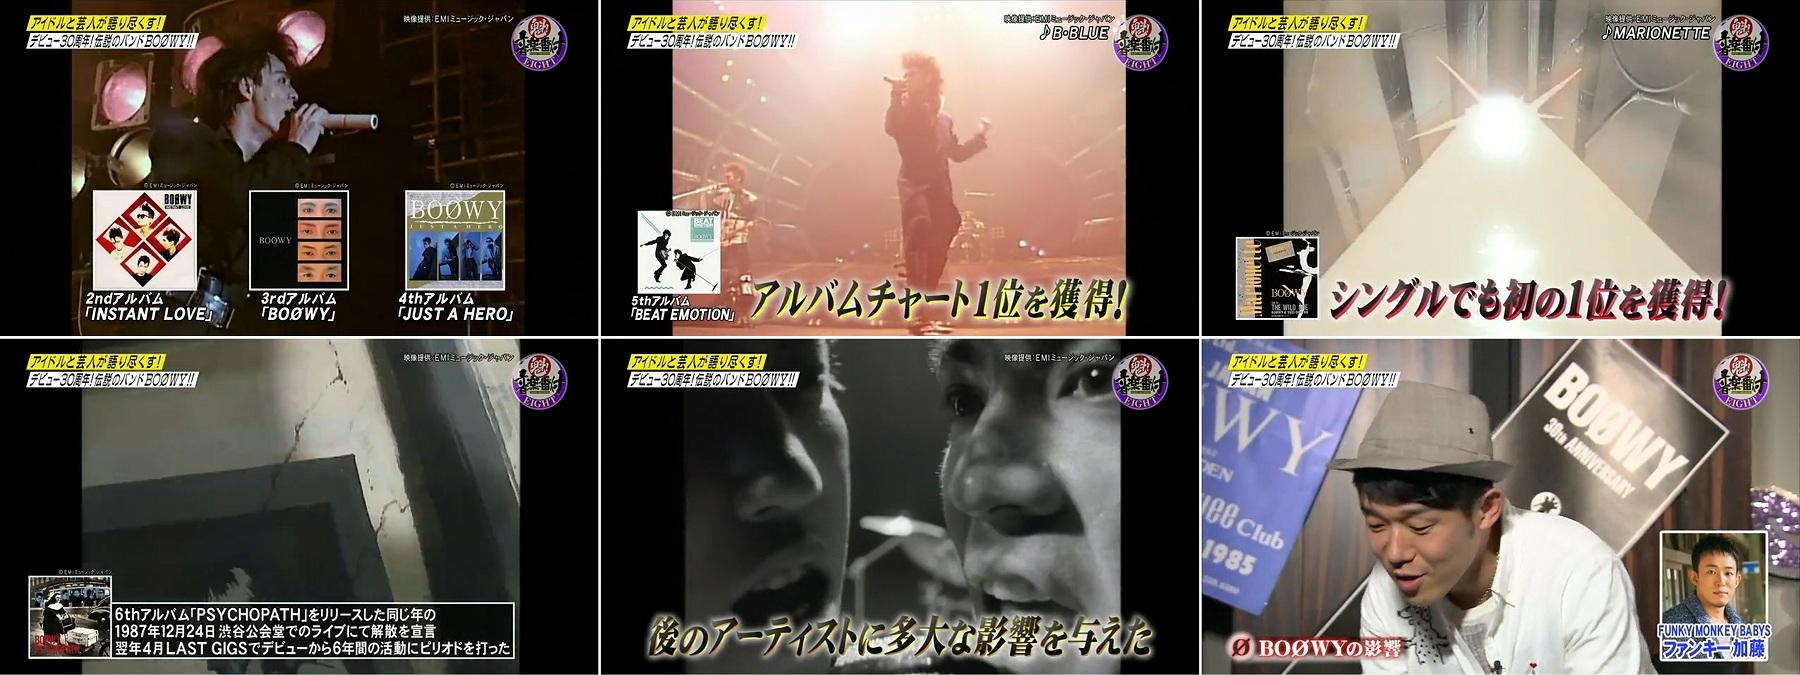 sakigakeboowy06.jpg